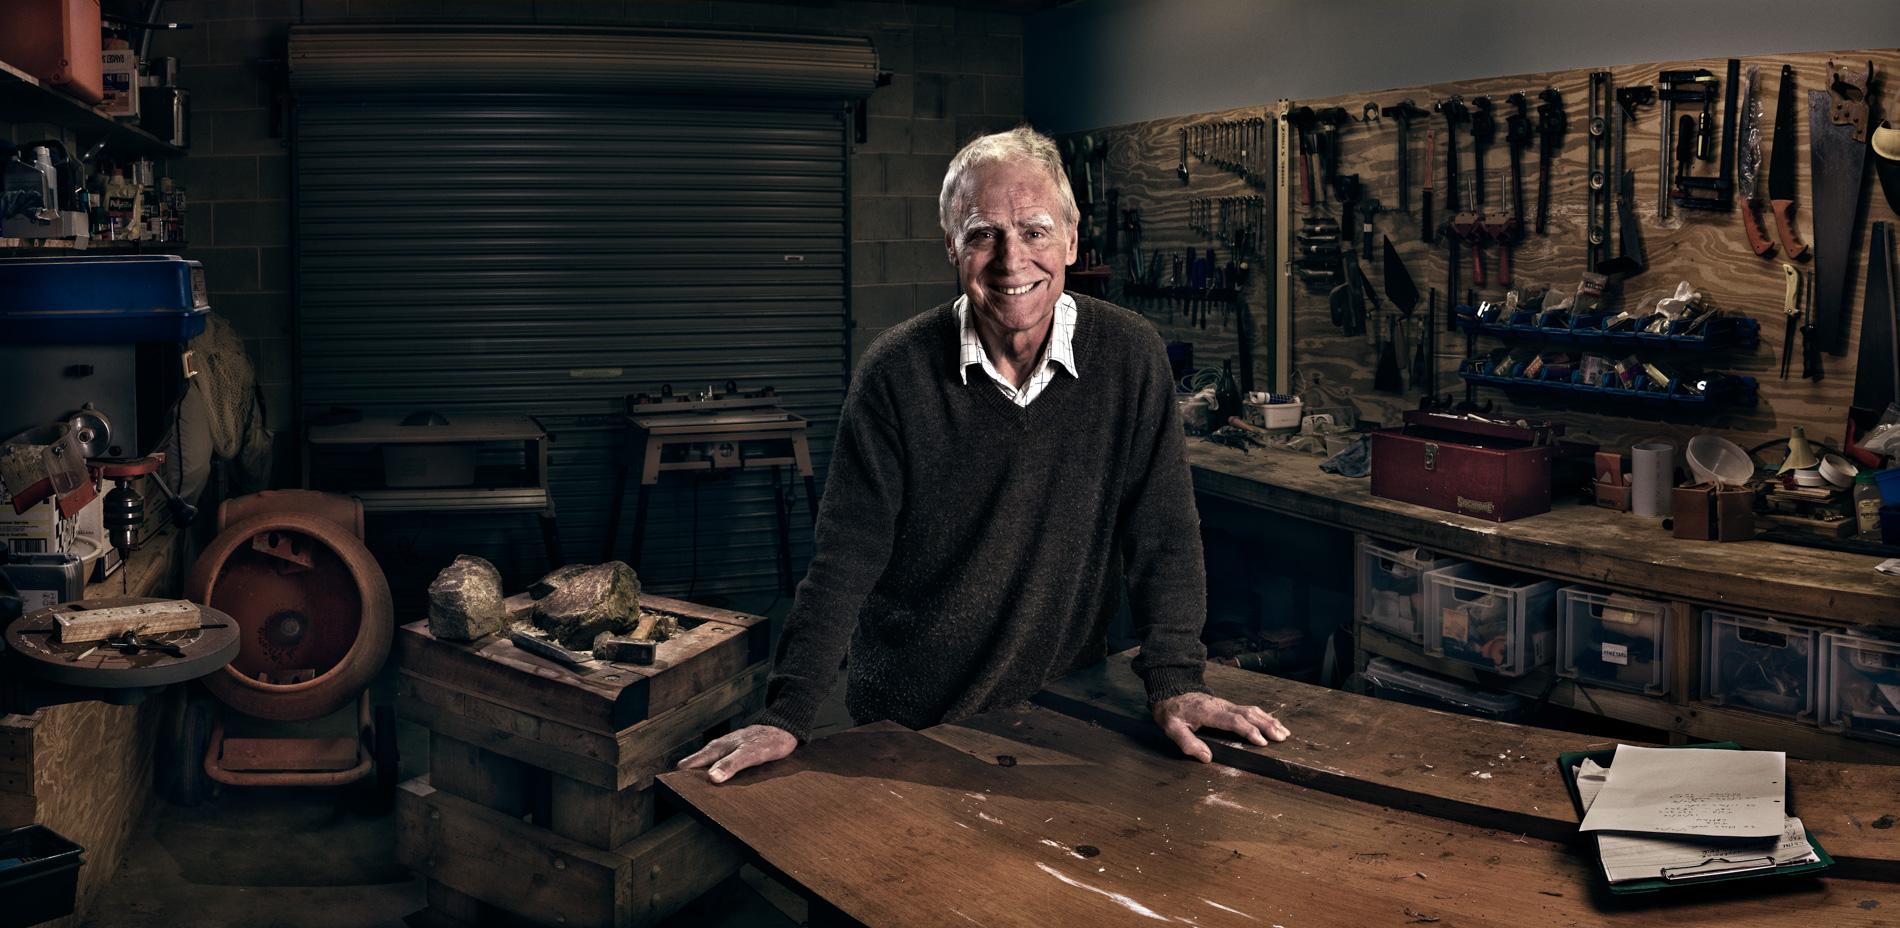 George stonemasonry, woodwork, viticulture and winemaking environmental portrait